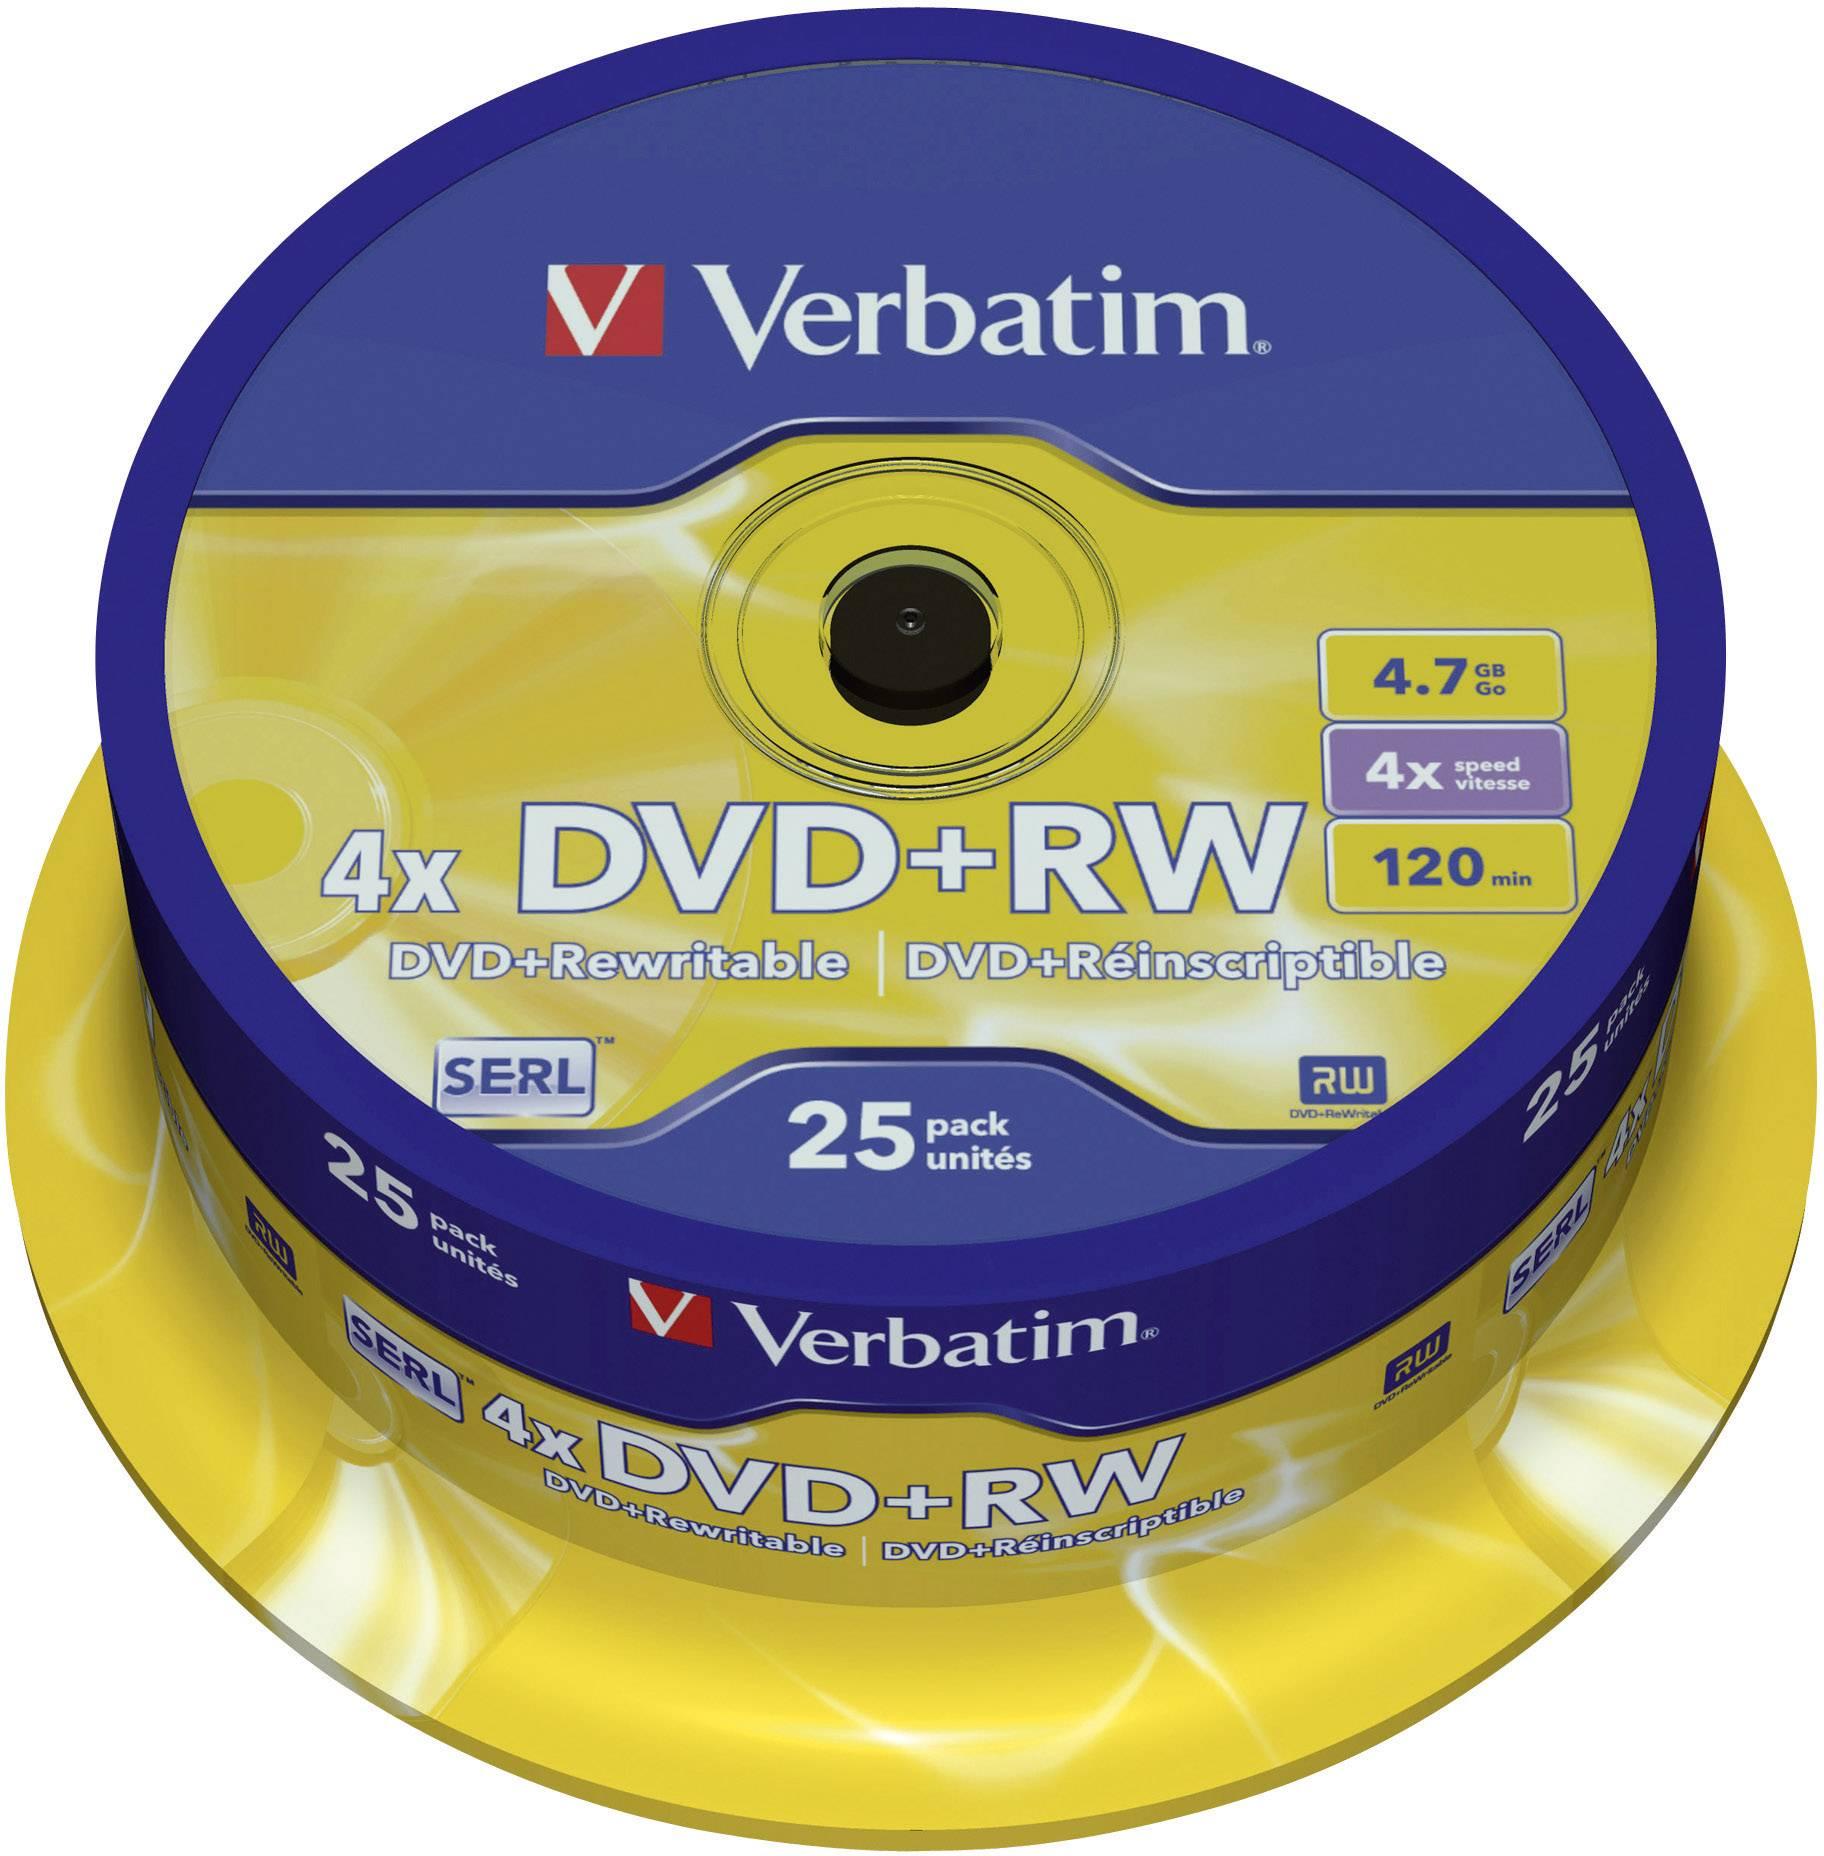 DVD+RW 4.7 GB Verbatim 43489, prepisovateľné, 25 ks, vreteno